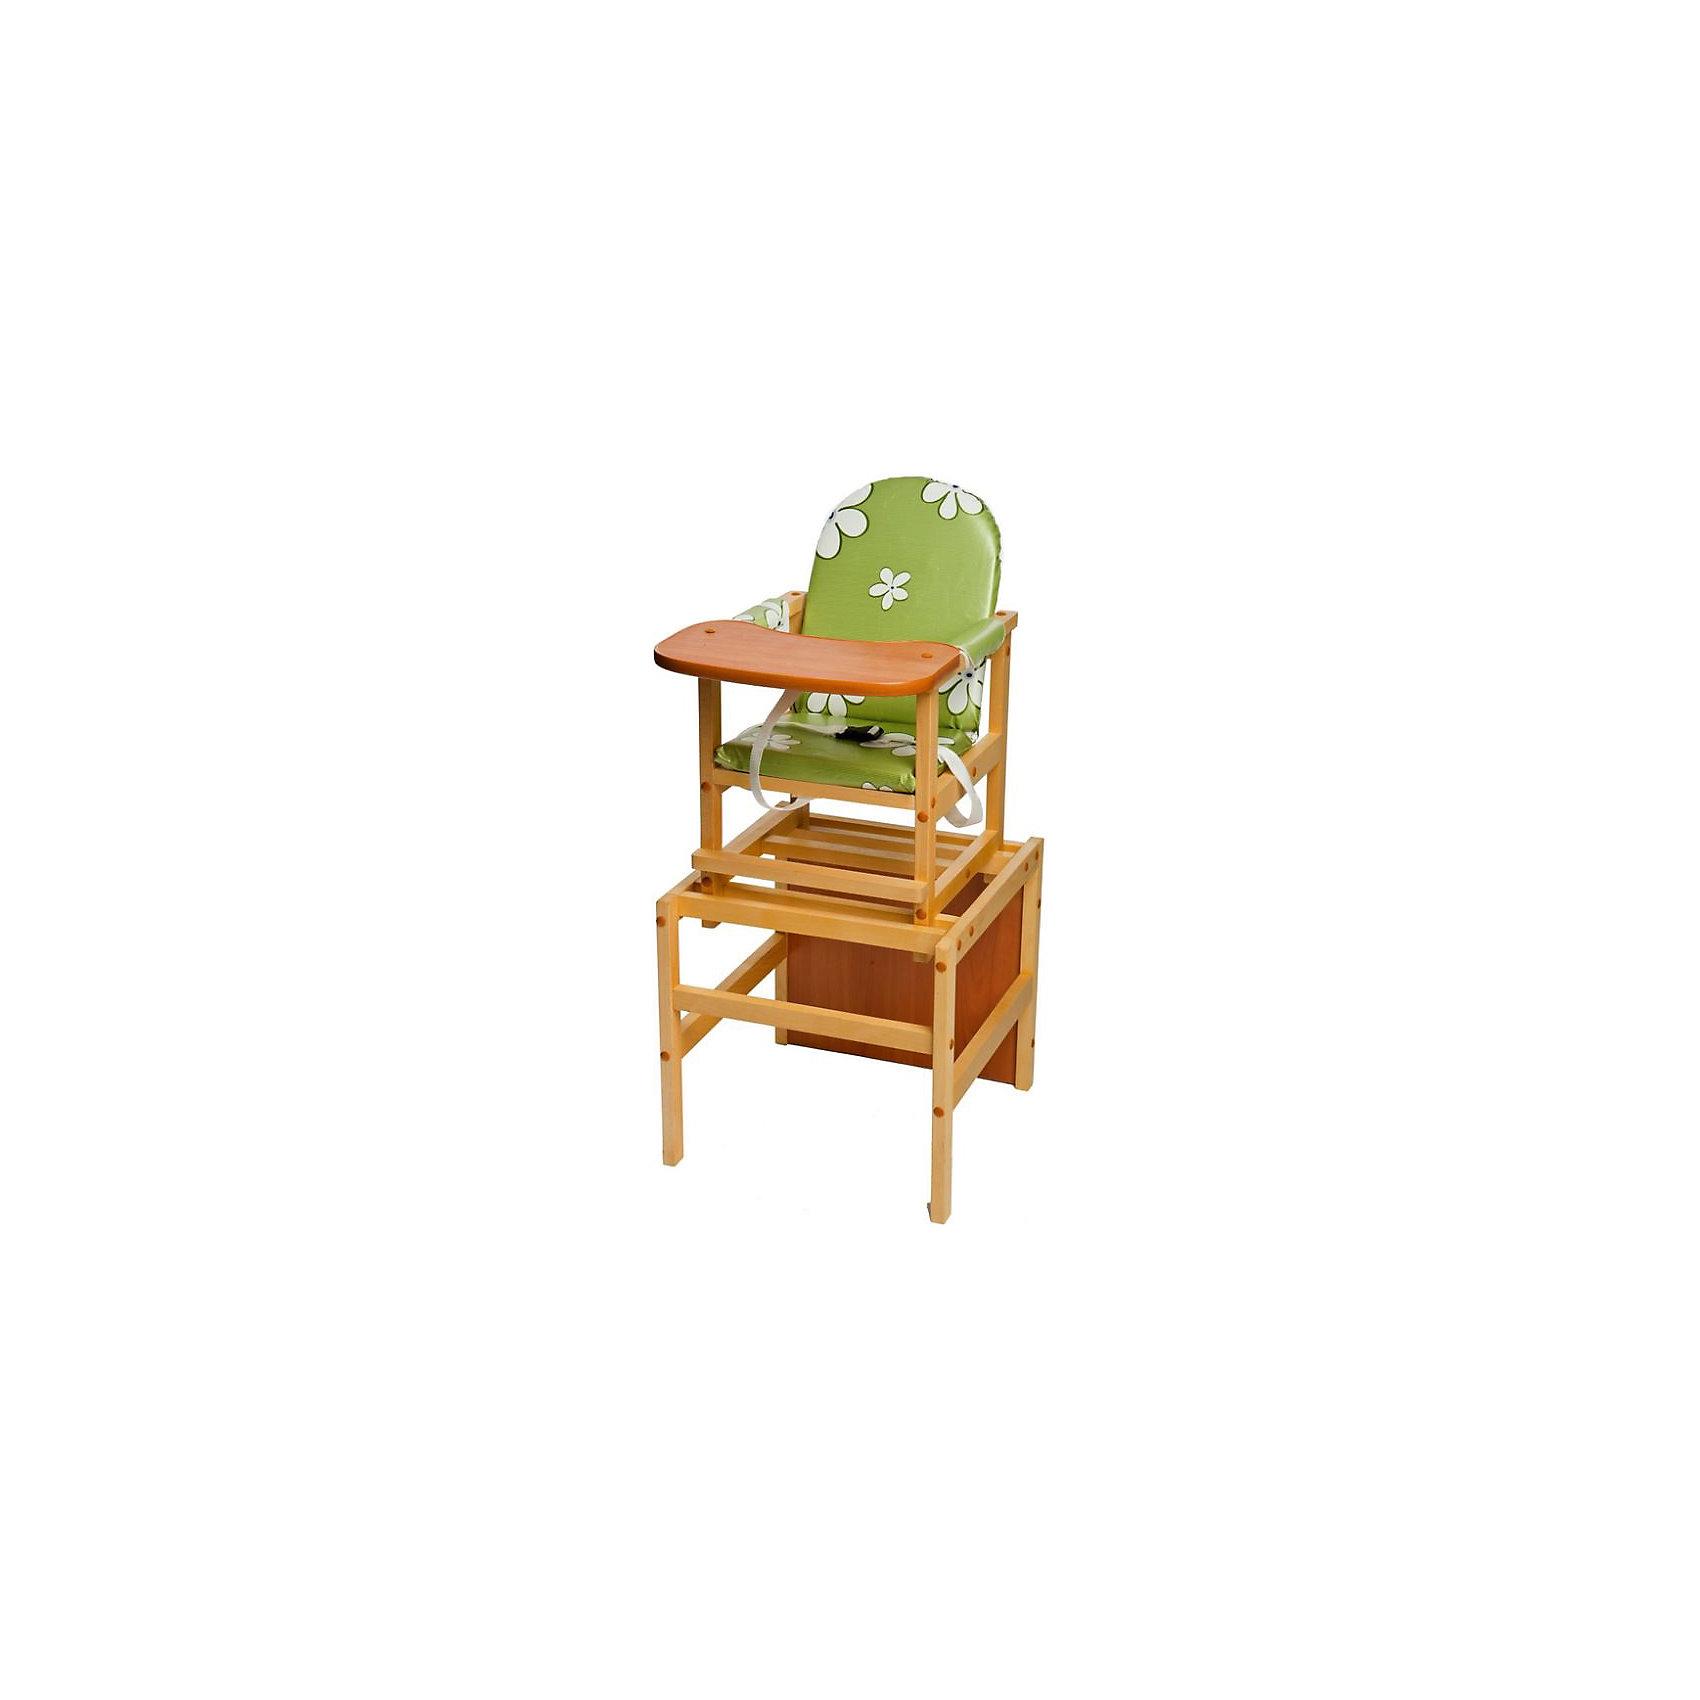 ПМДК Стульчик-трансформер Октябренок Ромашки, ПМДК, зеленый стул пмдк октябренок ромашки violet light 00000045543